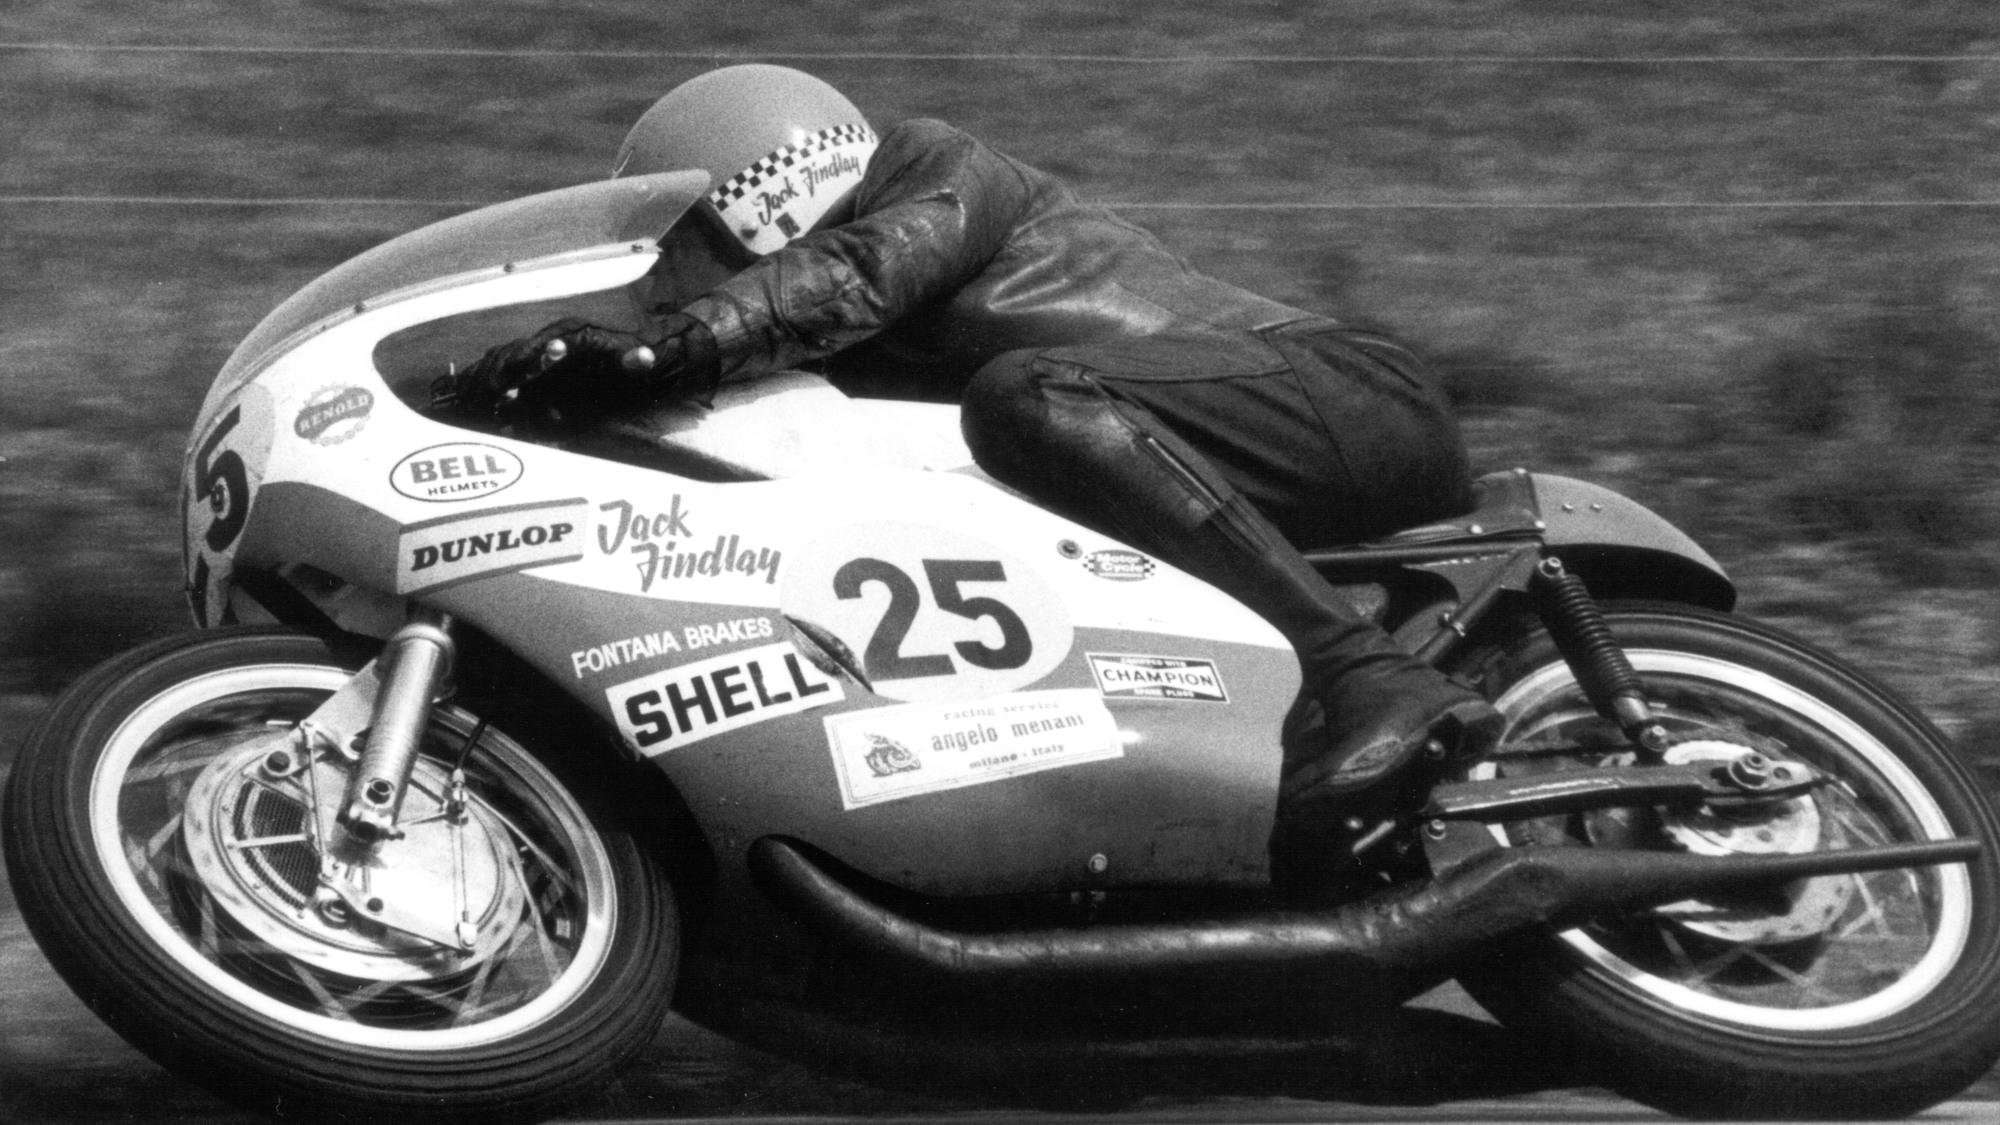 Jack Findlay, 1971